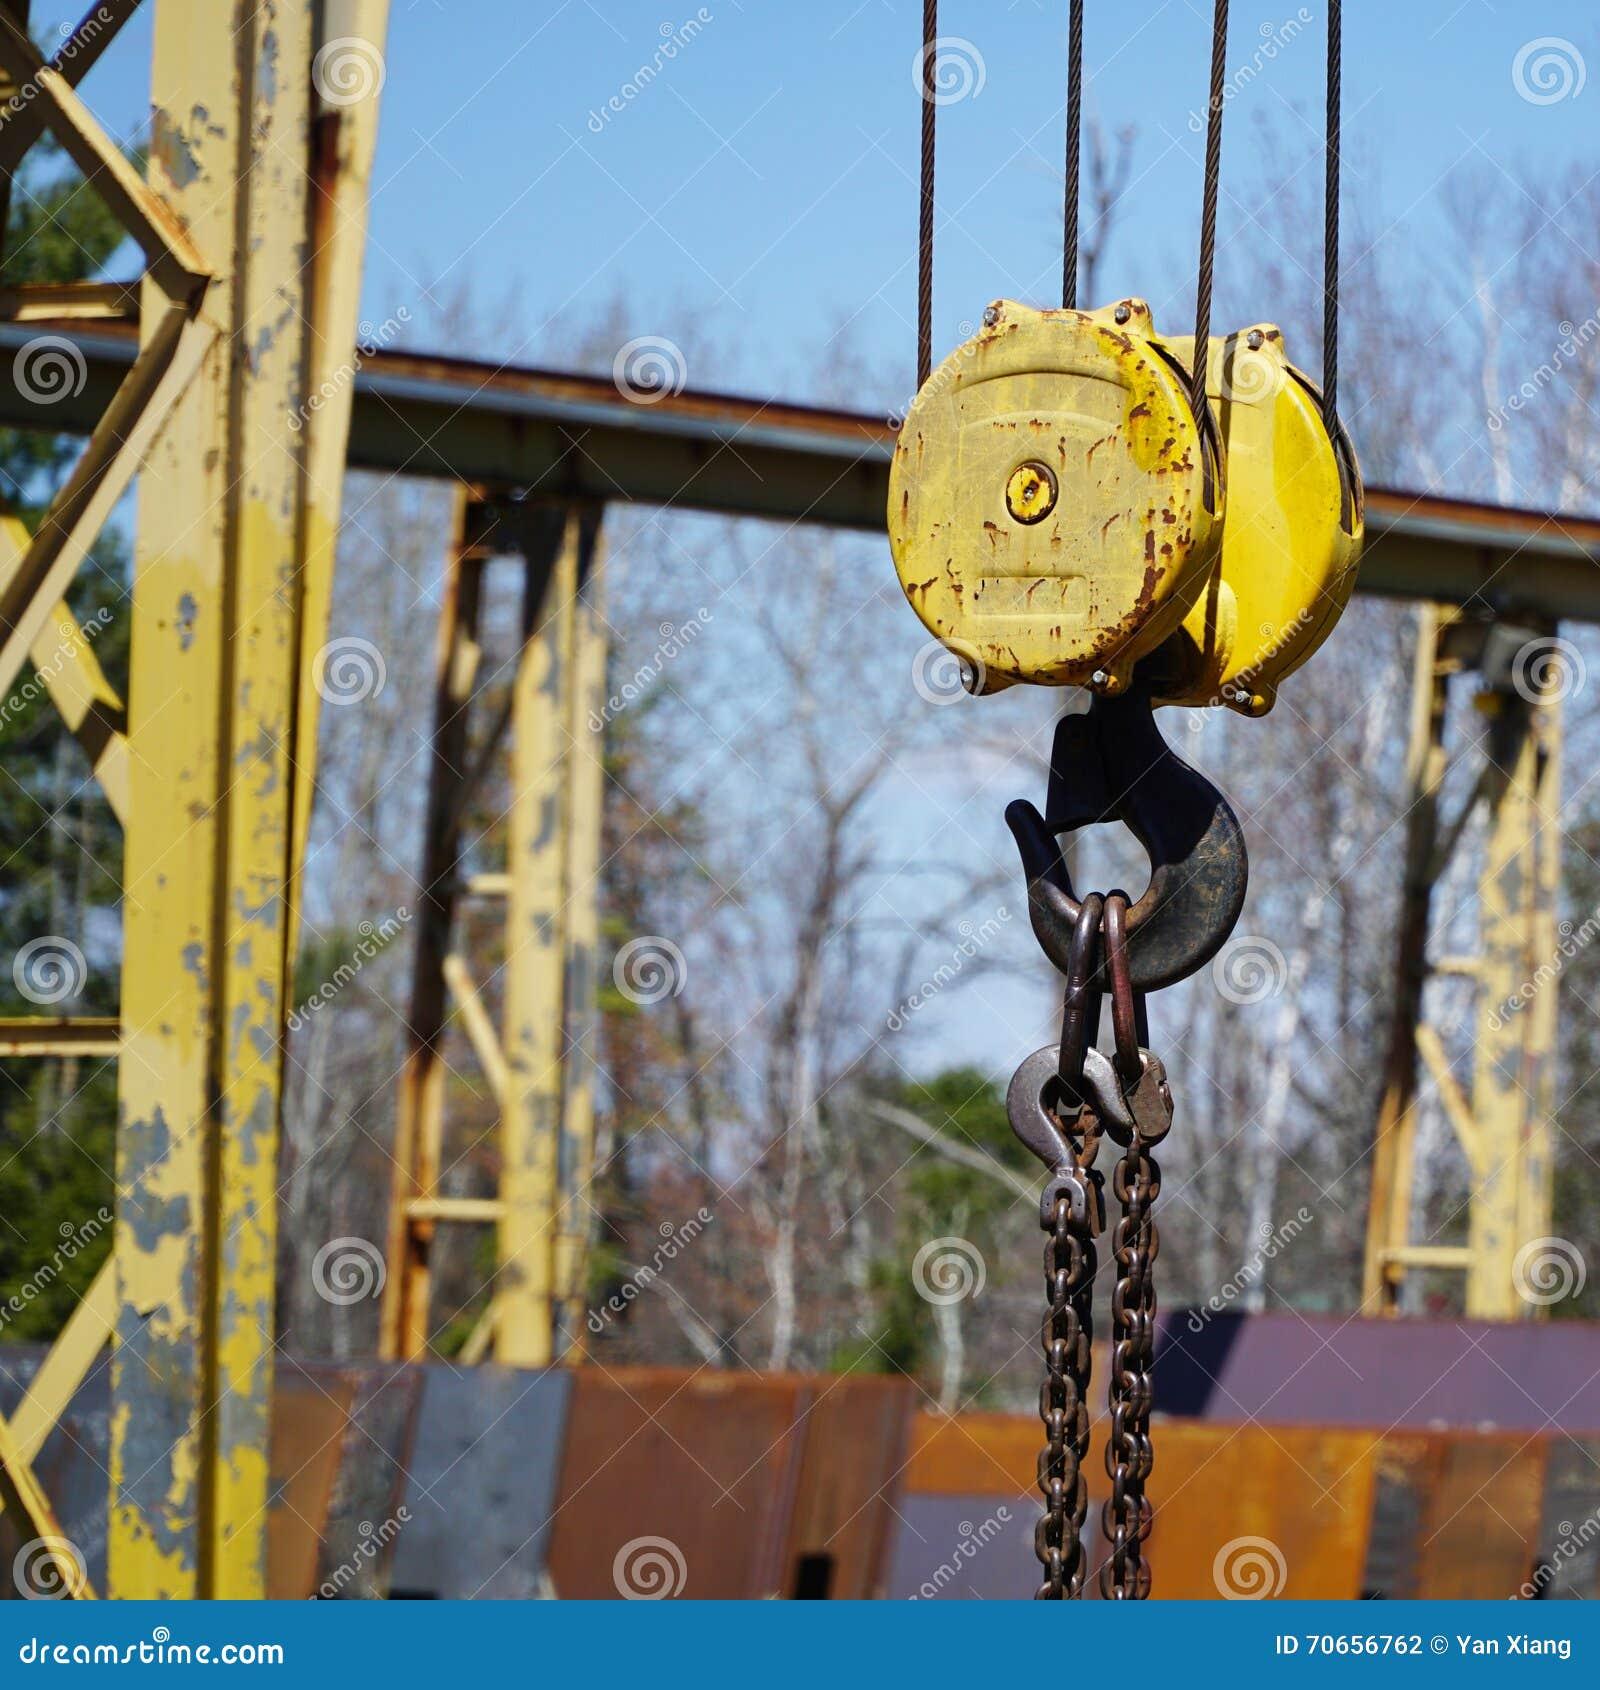 Hook up lifting equipment